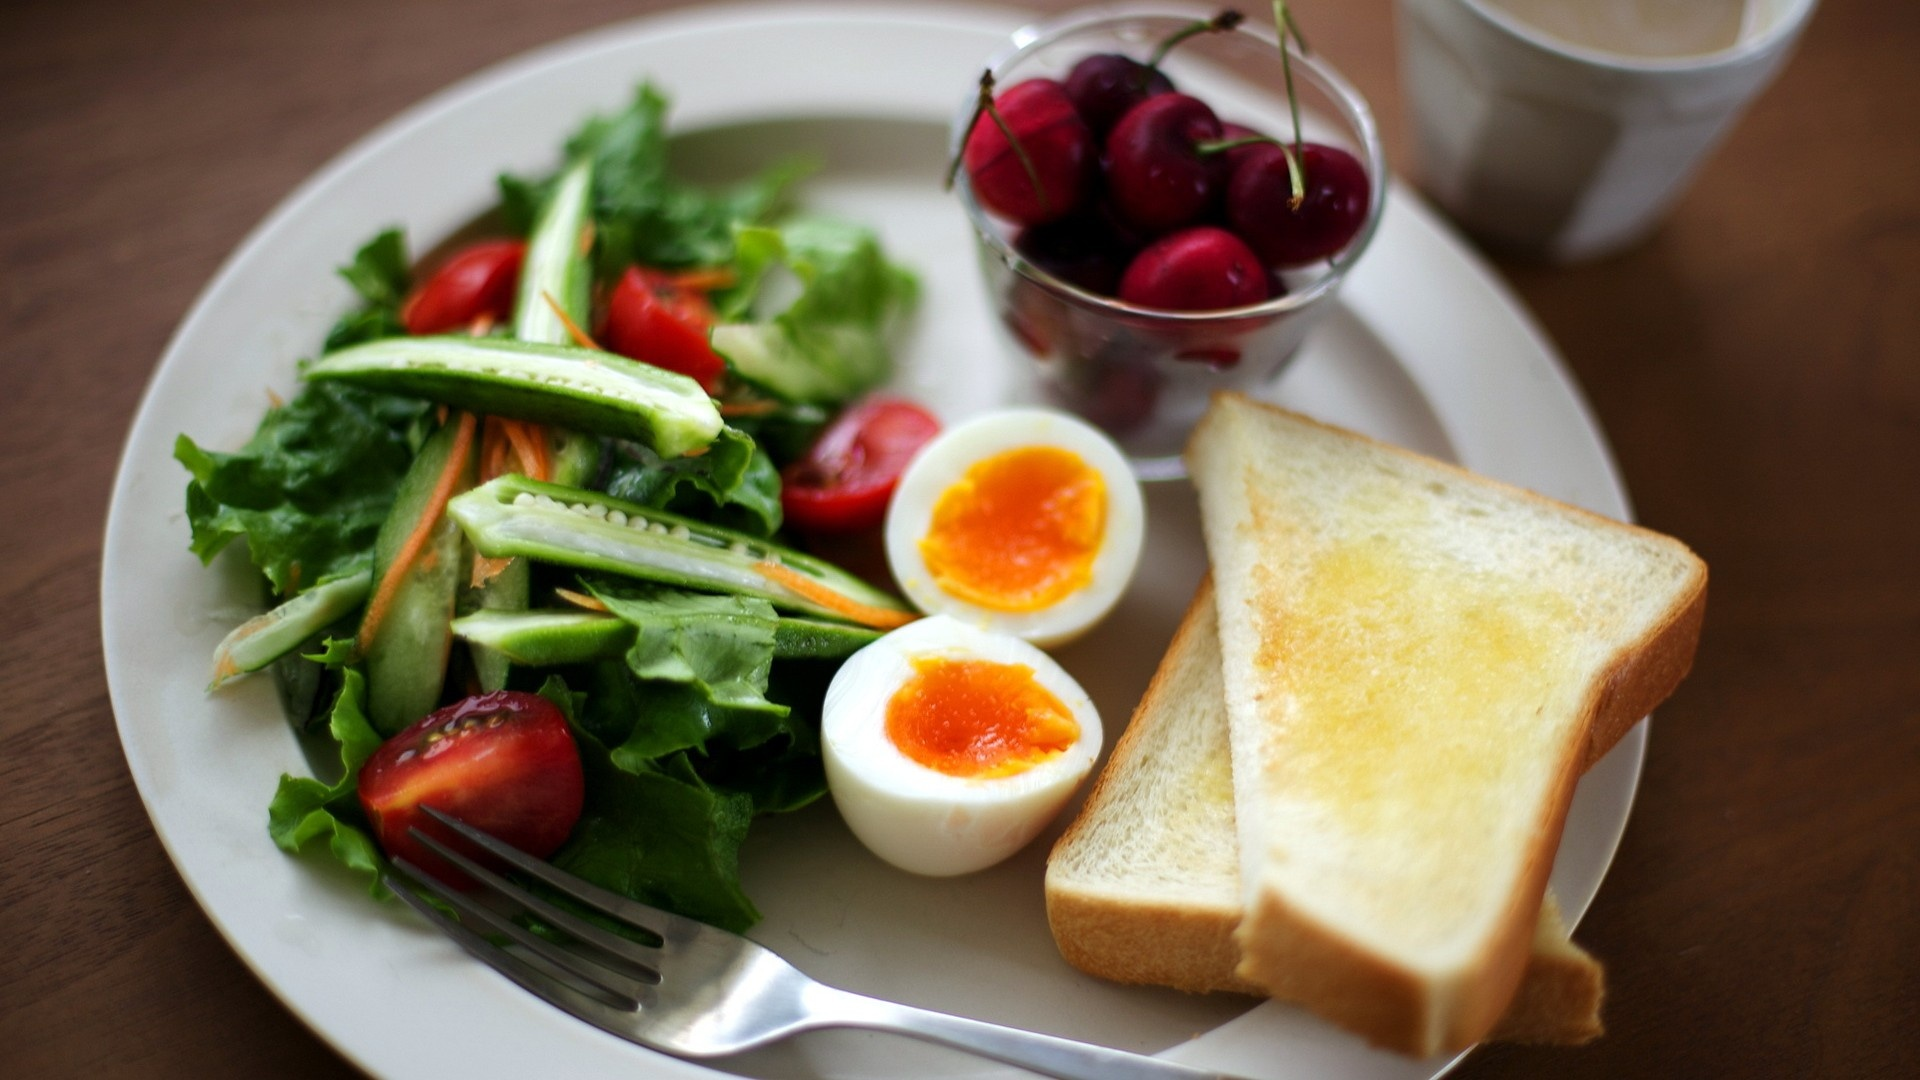 Awesome Breakfast Good Morning Wallpaper Free Download: Salad Breakfast Healthy Hd Wallpaper 1920x1080px